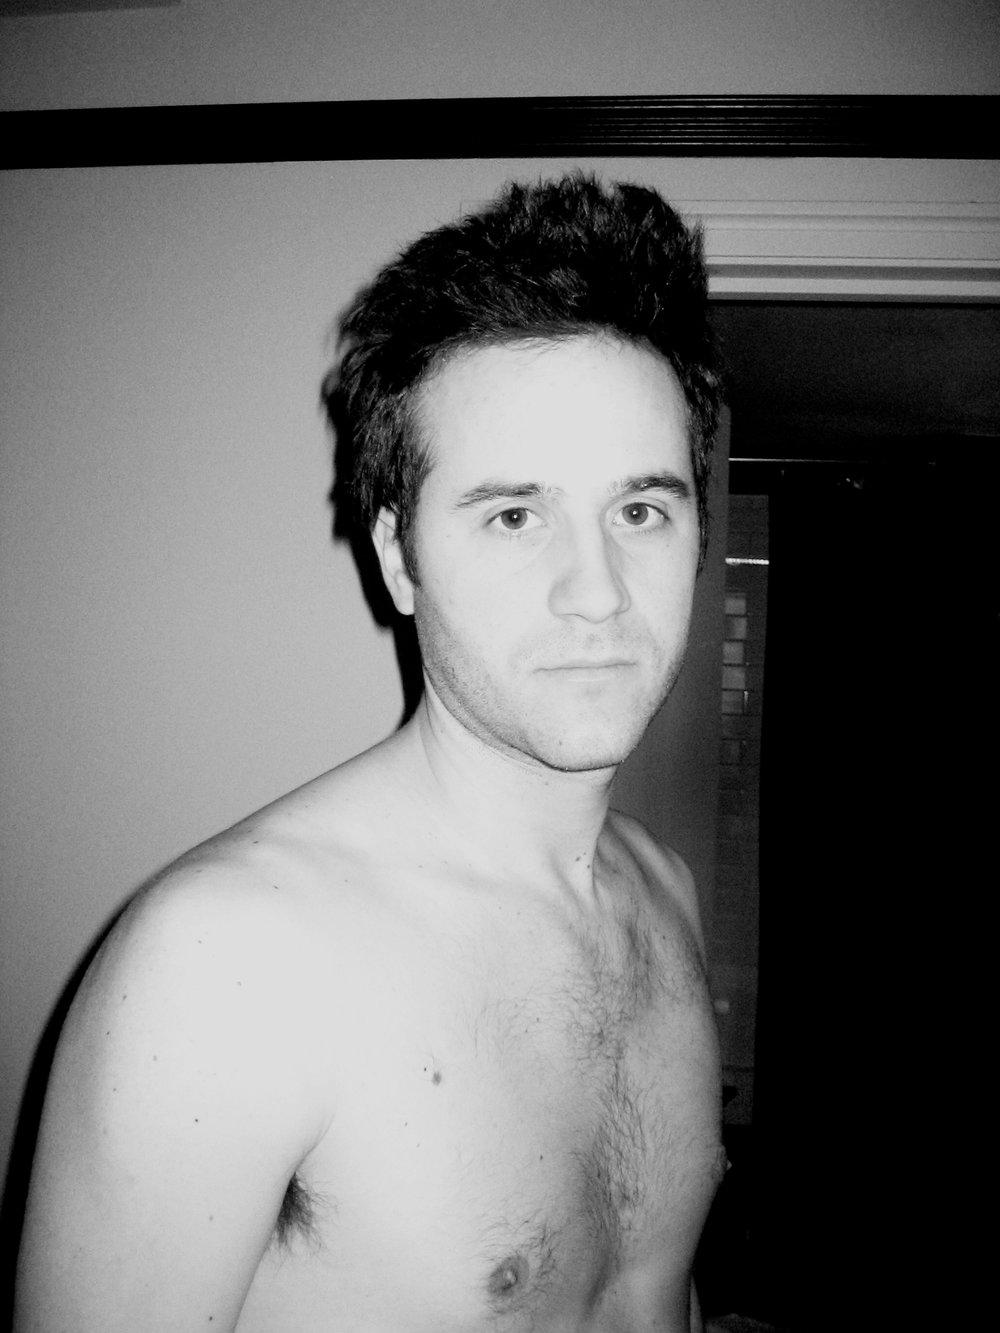 David, 2009